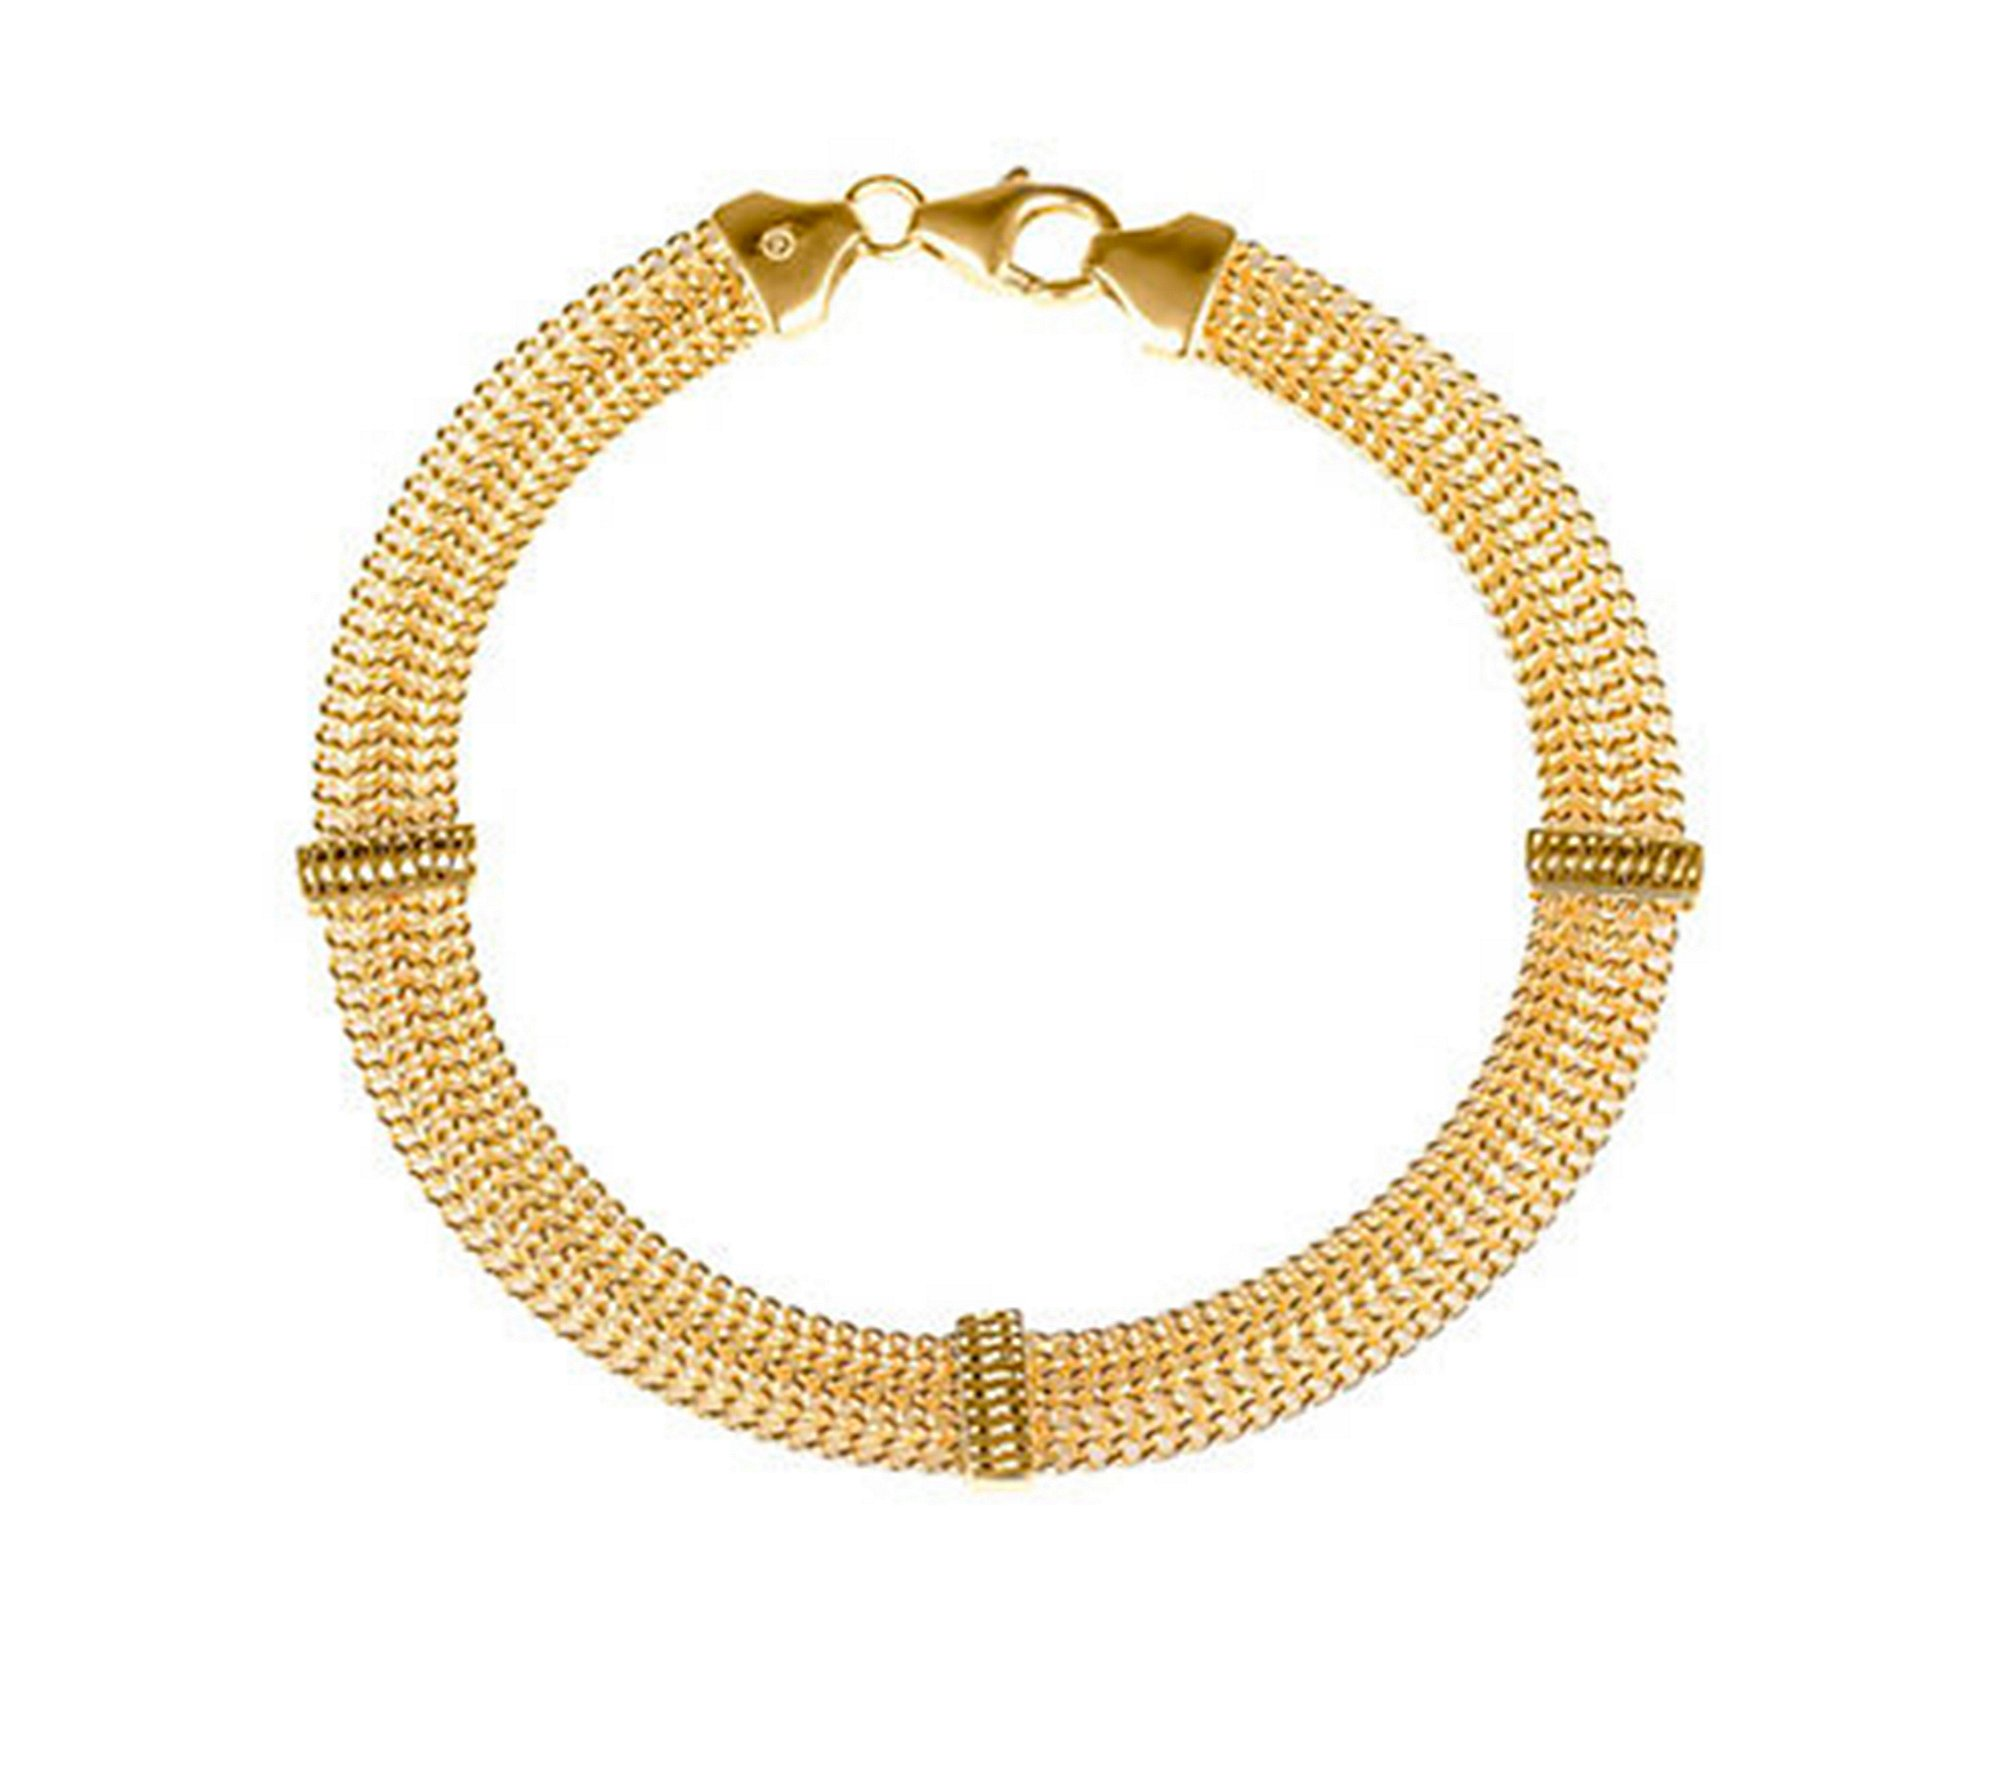 14K Yellow Gold Arrow Link Bracelet